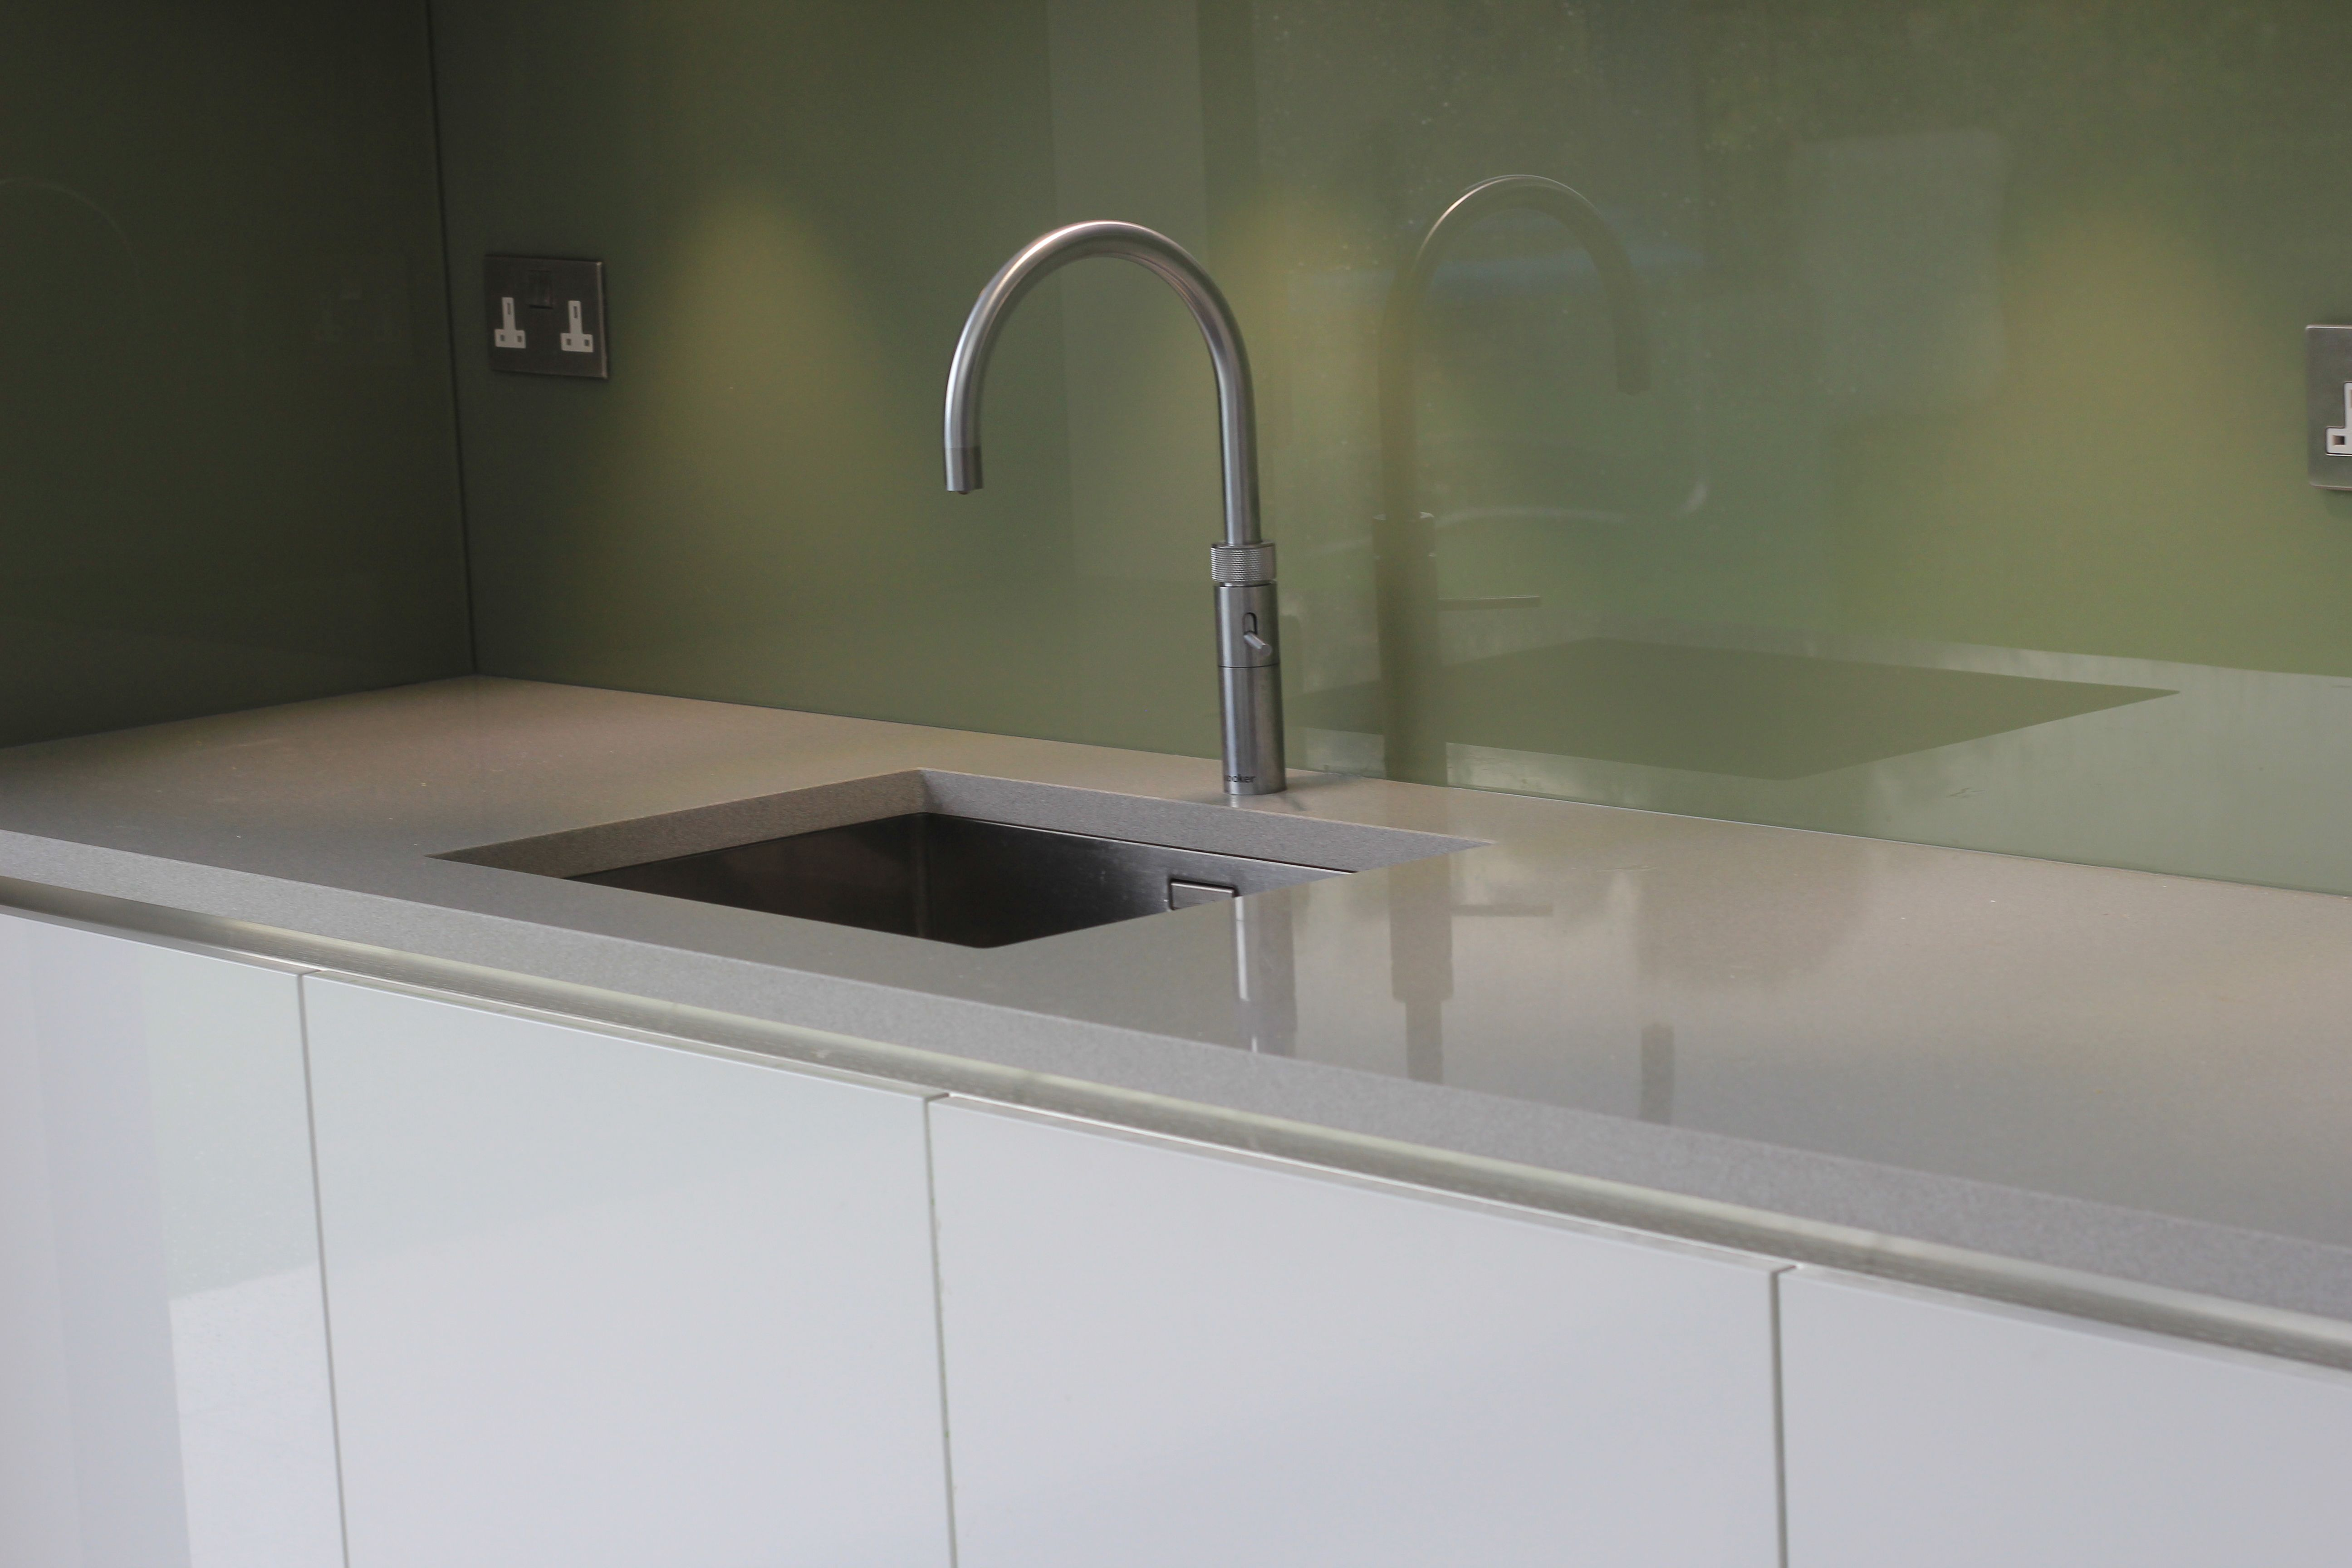 Solid Surface · Silestone Aluminio Nube Grey / Silver Quartz Worktops With  Green Glass Splashback And Undermount Sink.